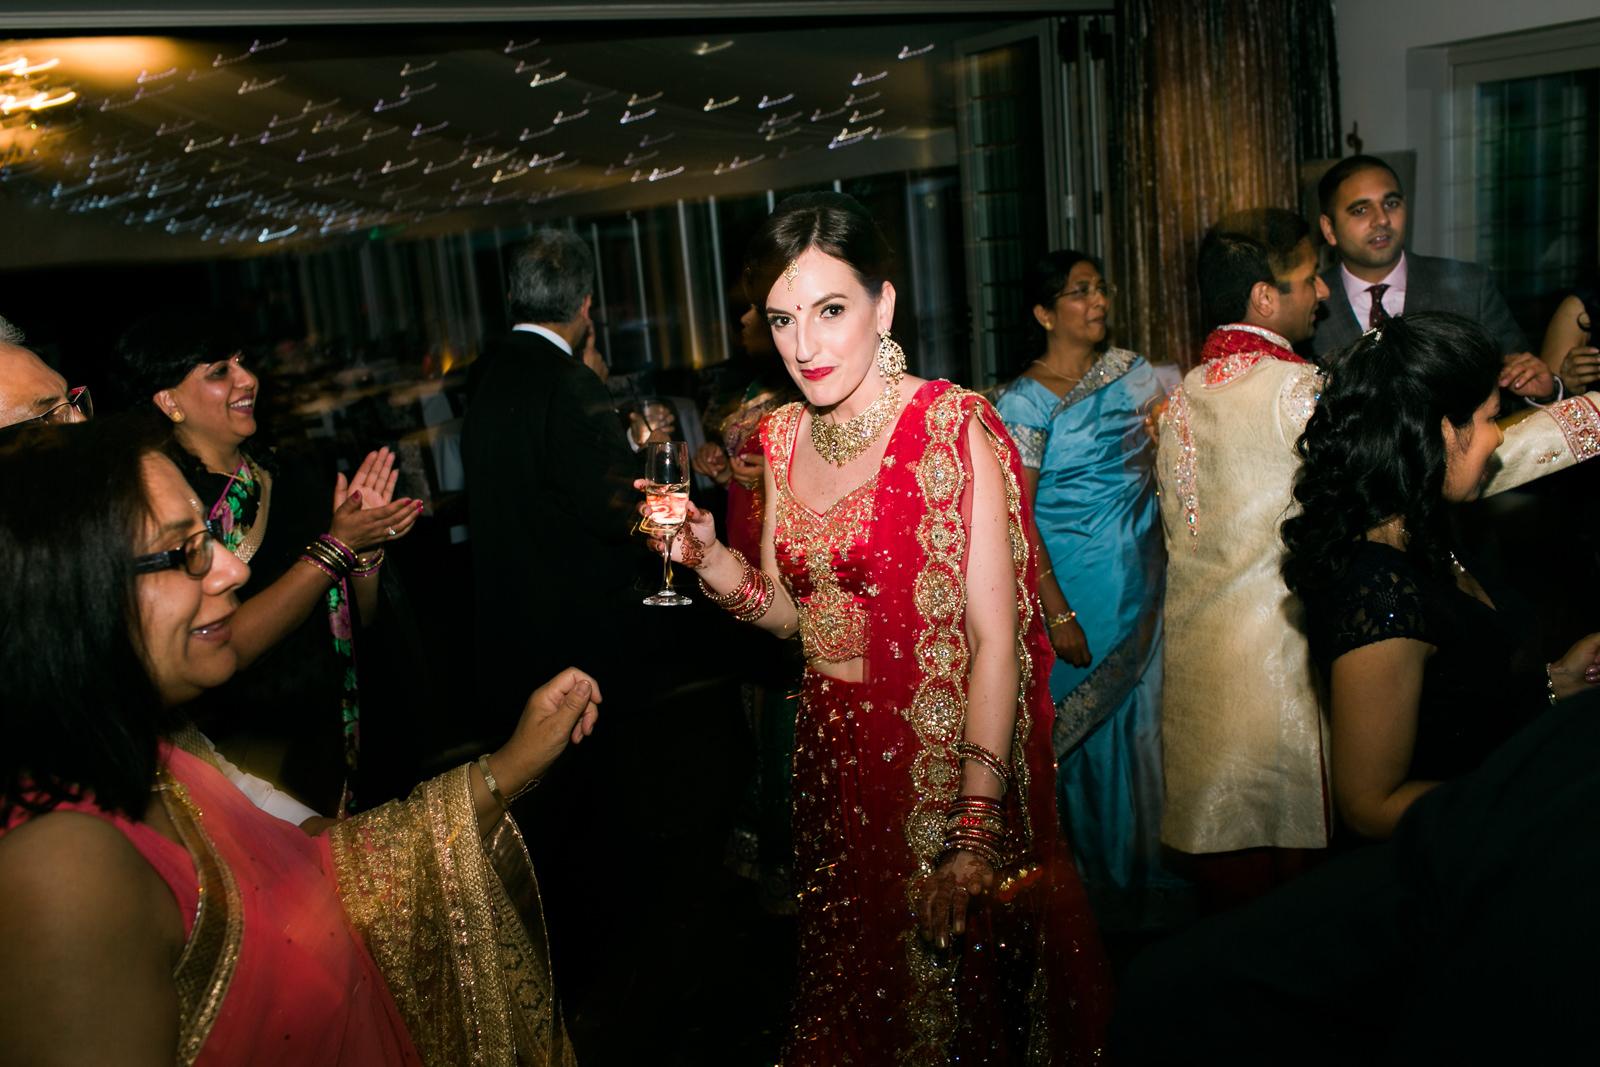 Olivia + Vinny Hogarths Wedding-317530.jpg